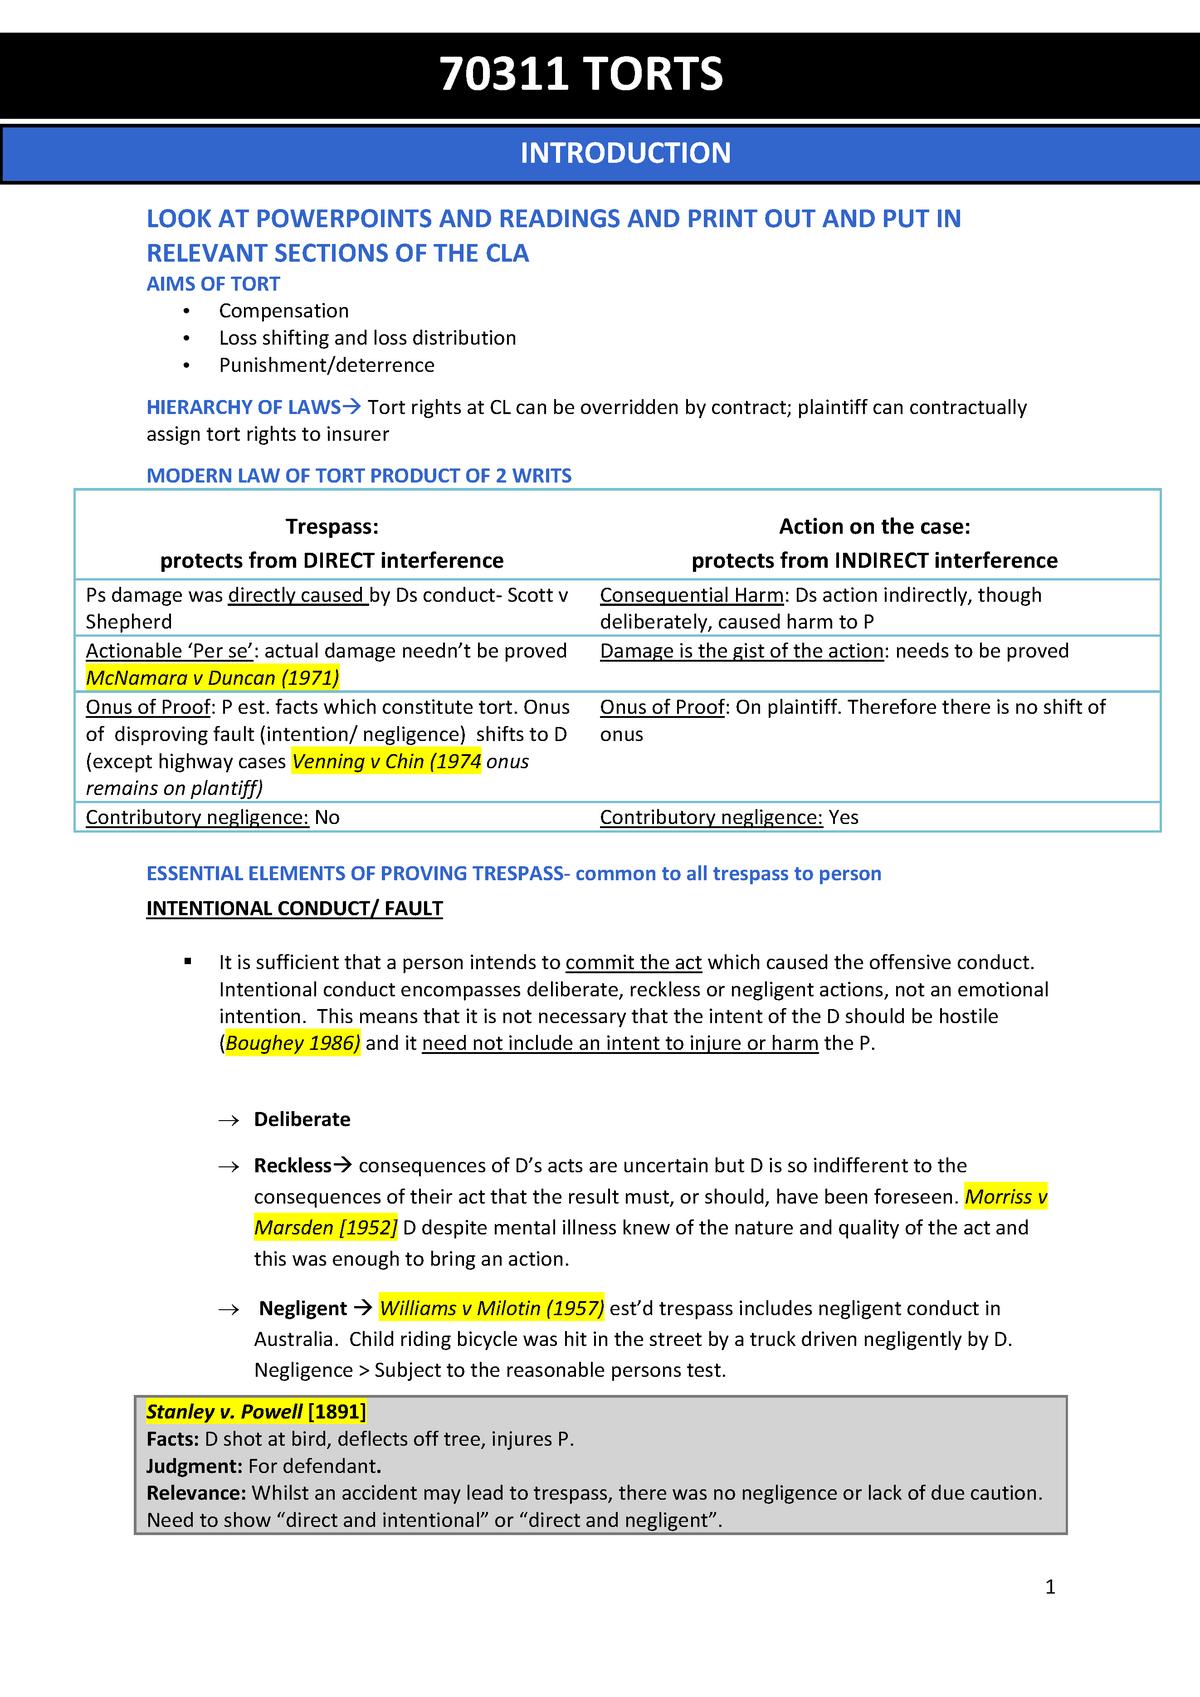 Torts Exam Notes - 070311 - UTS - StuDocu